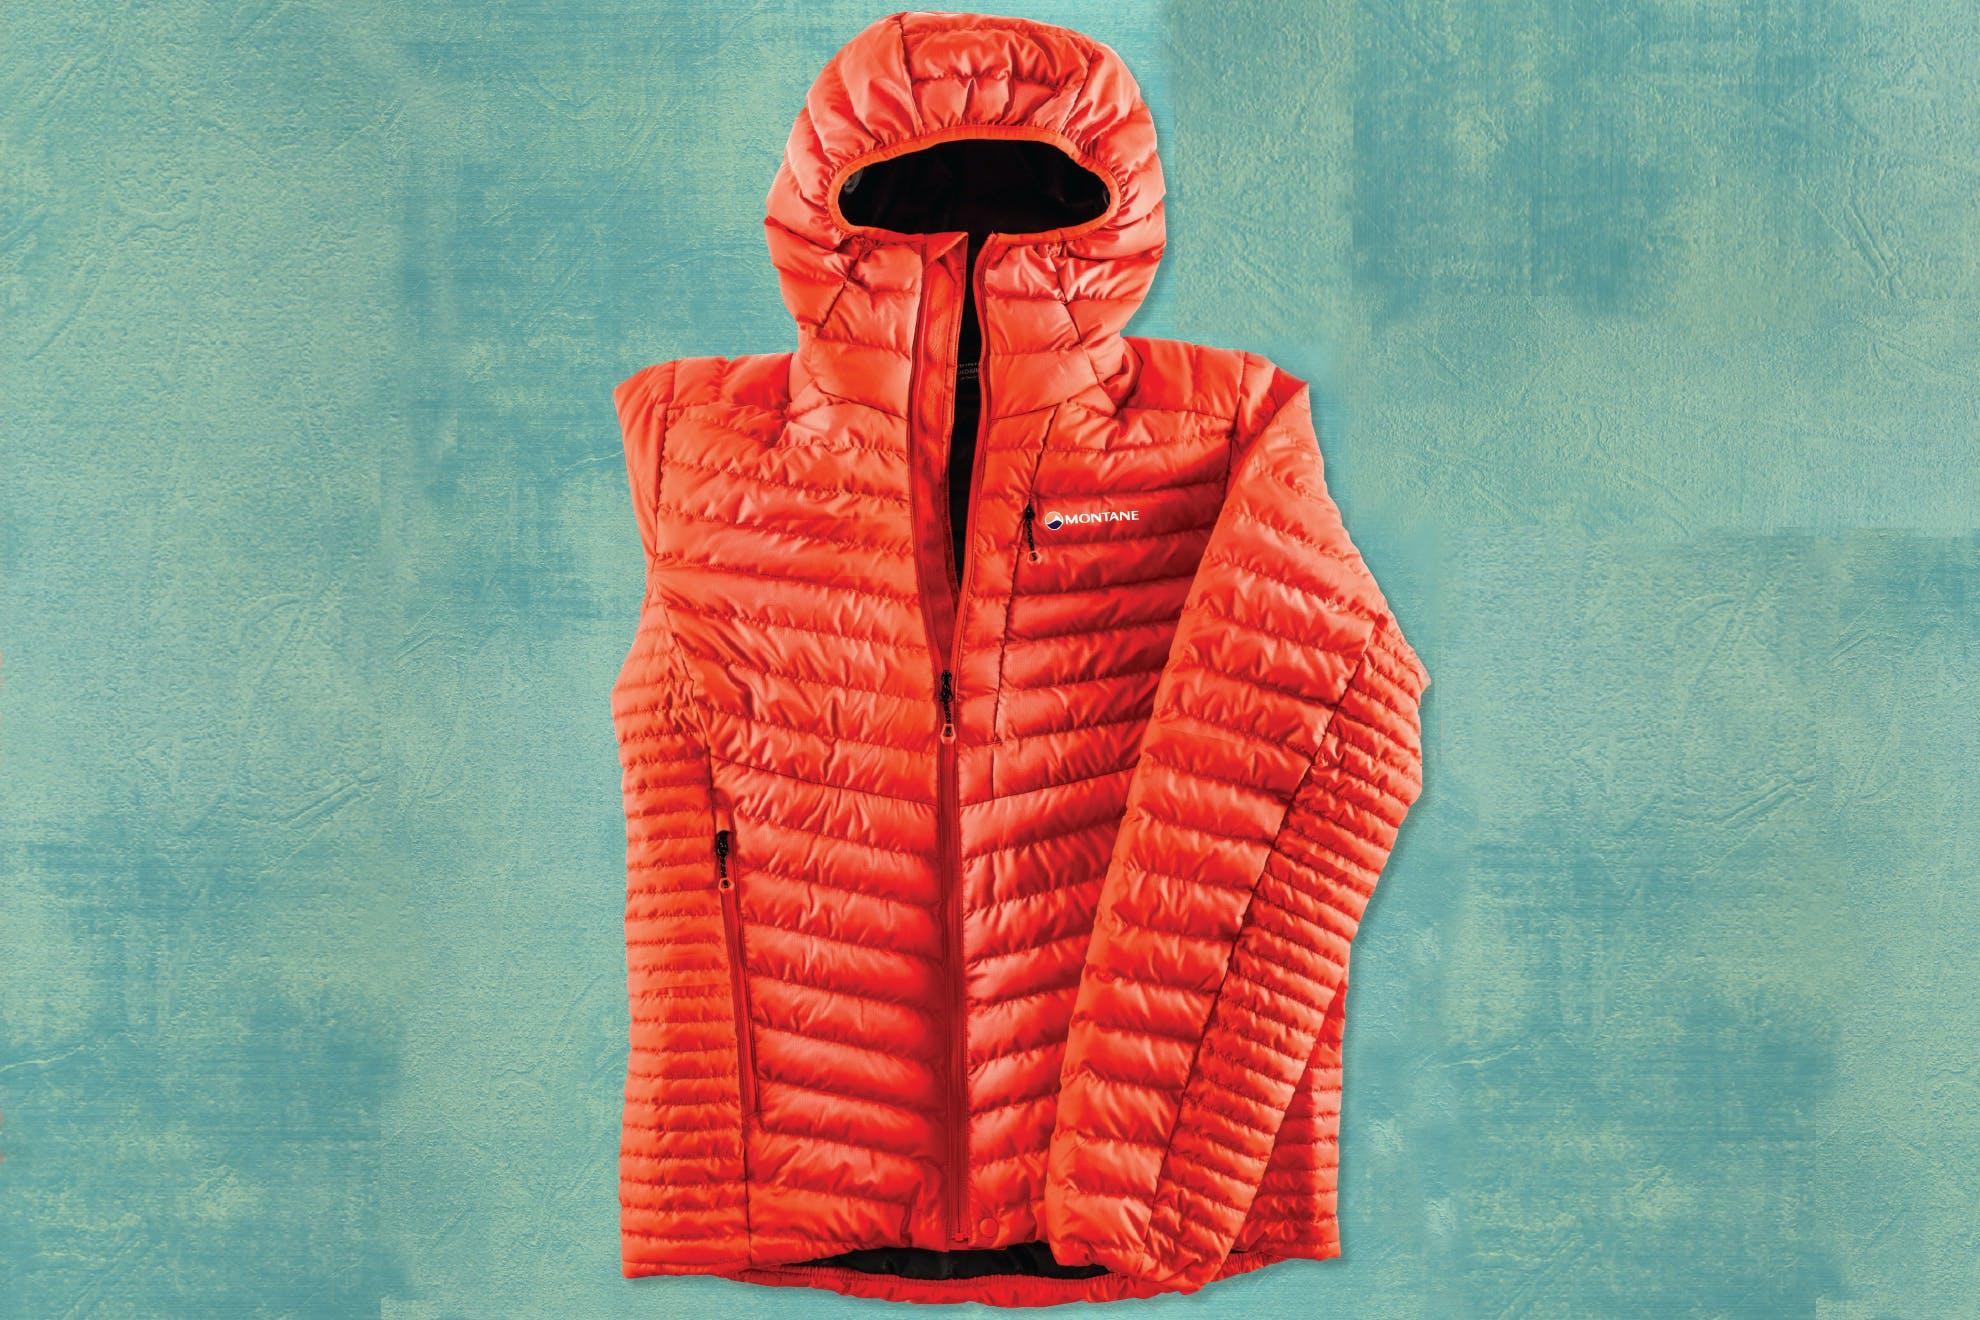 1b3b12fc5 2018 guide to insulated jackets - Wilderness Magazine NZ